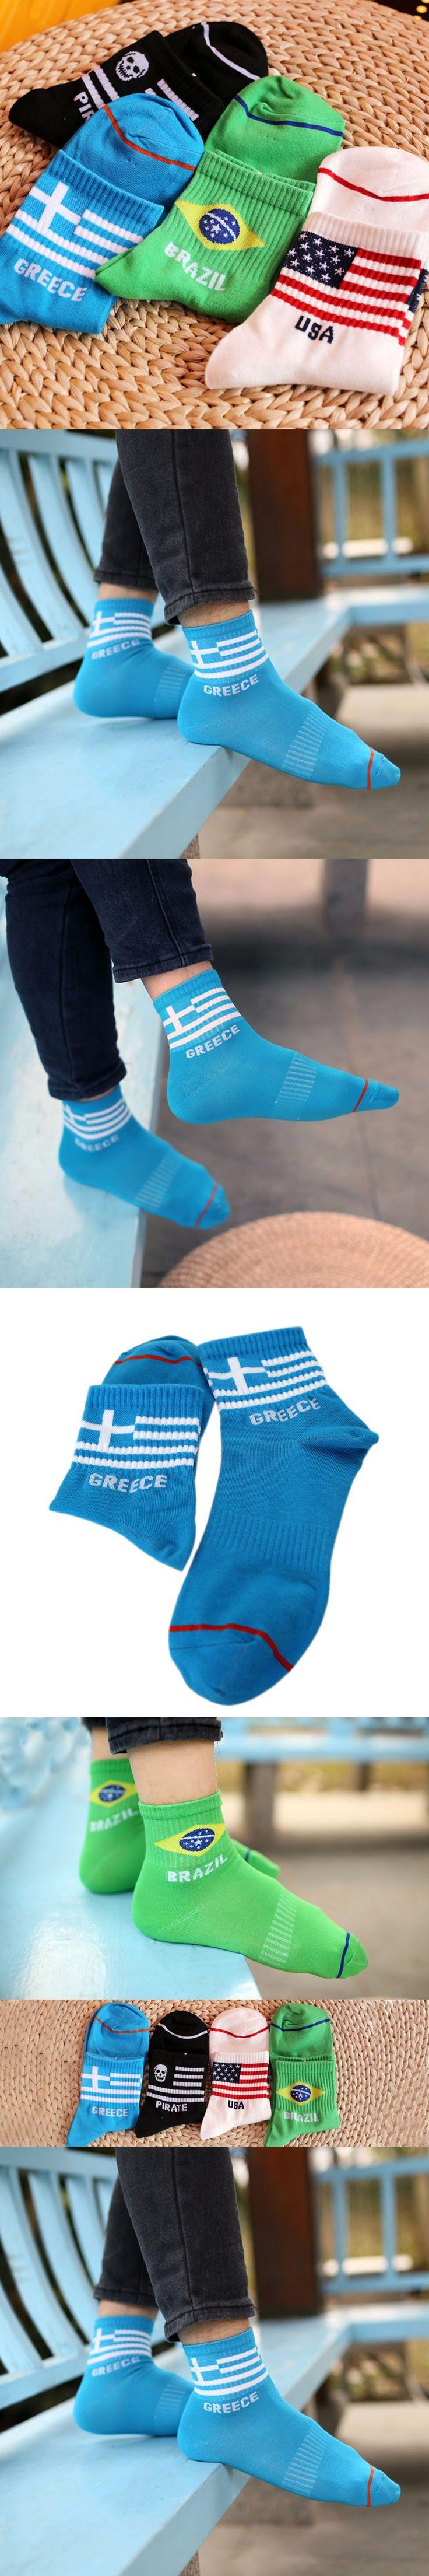 Fashion Cotton Warm Socks Good Quality Short Socks Warm  casual solid colors short socks